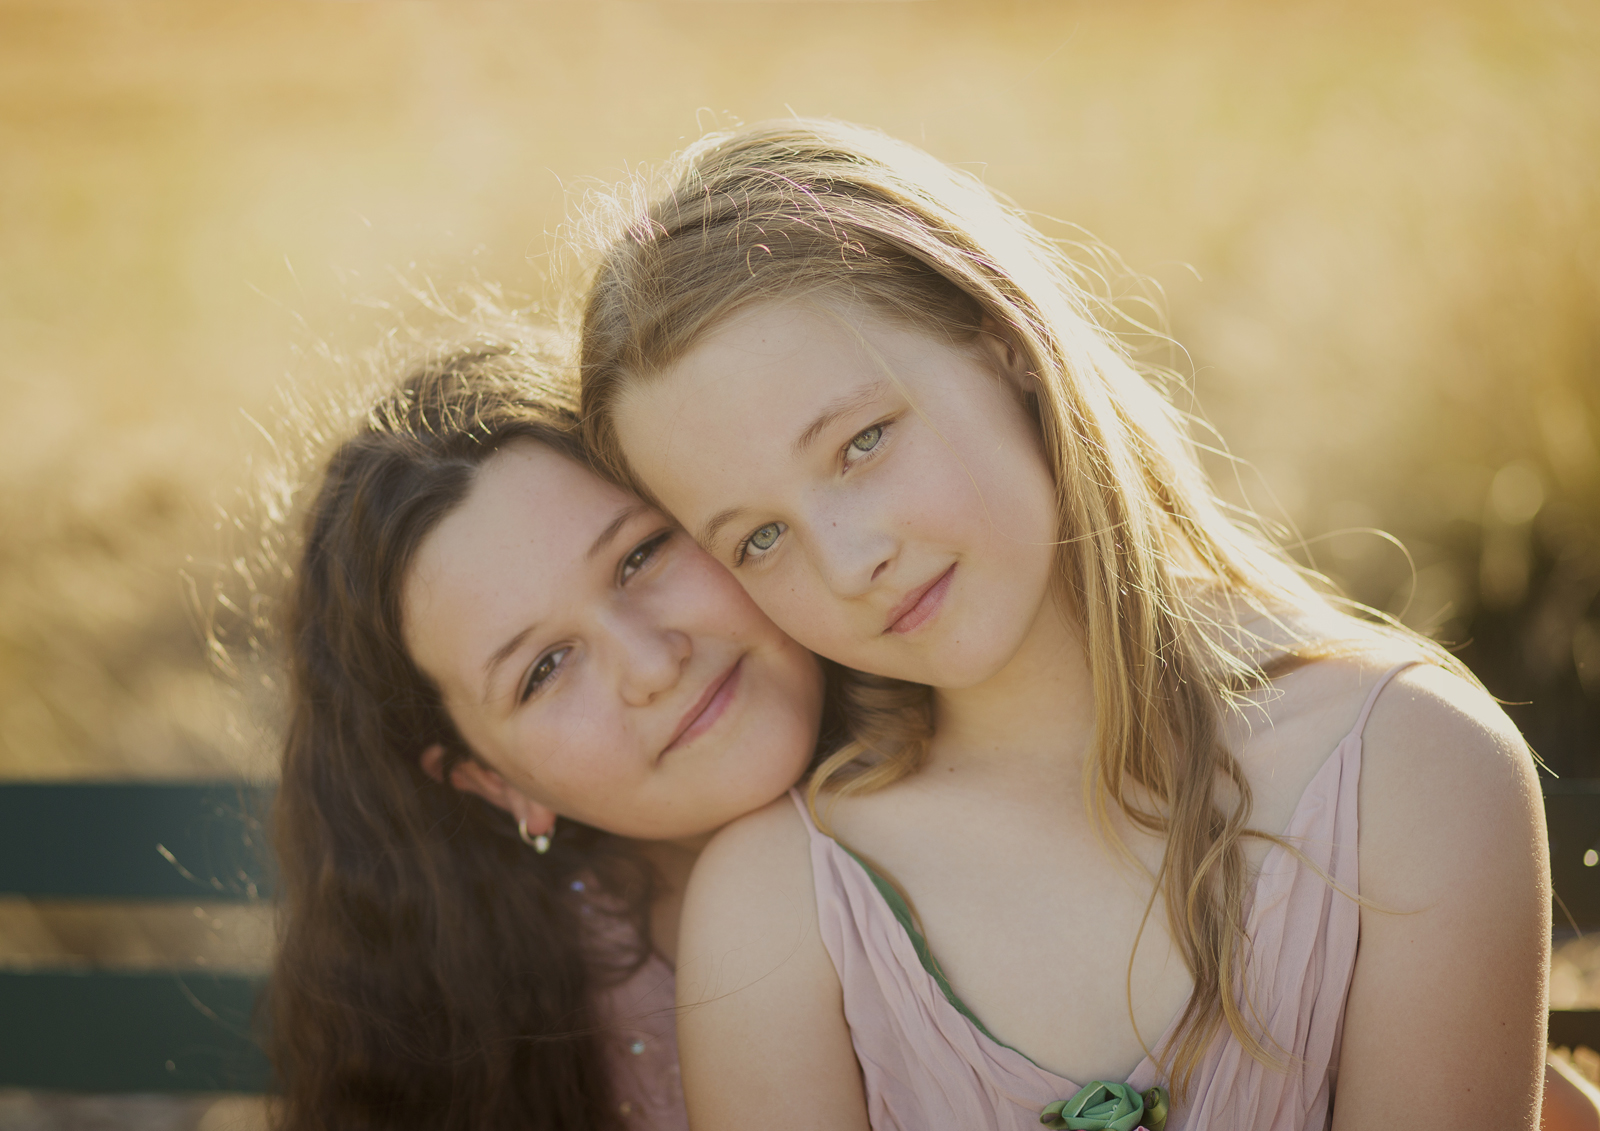 Children's Lifestyle Photography Melbourne